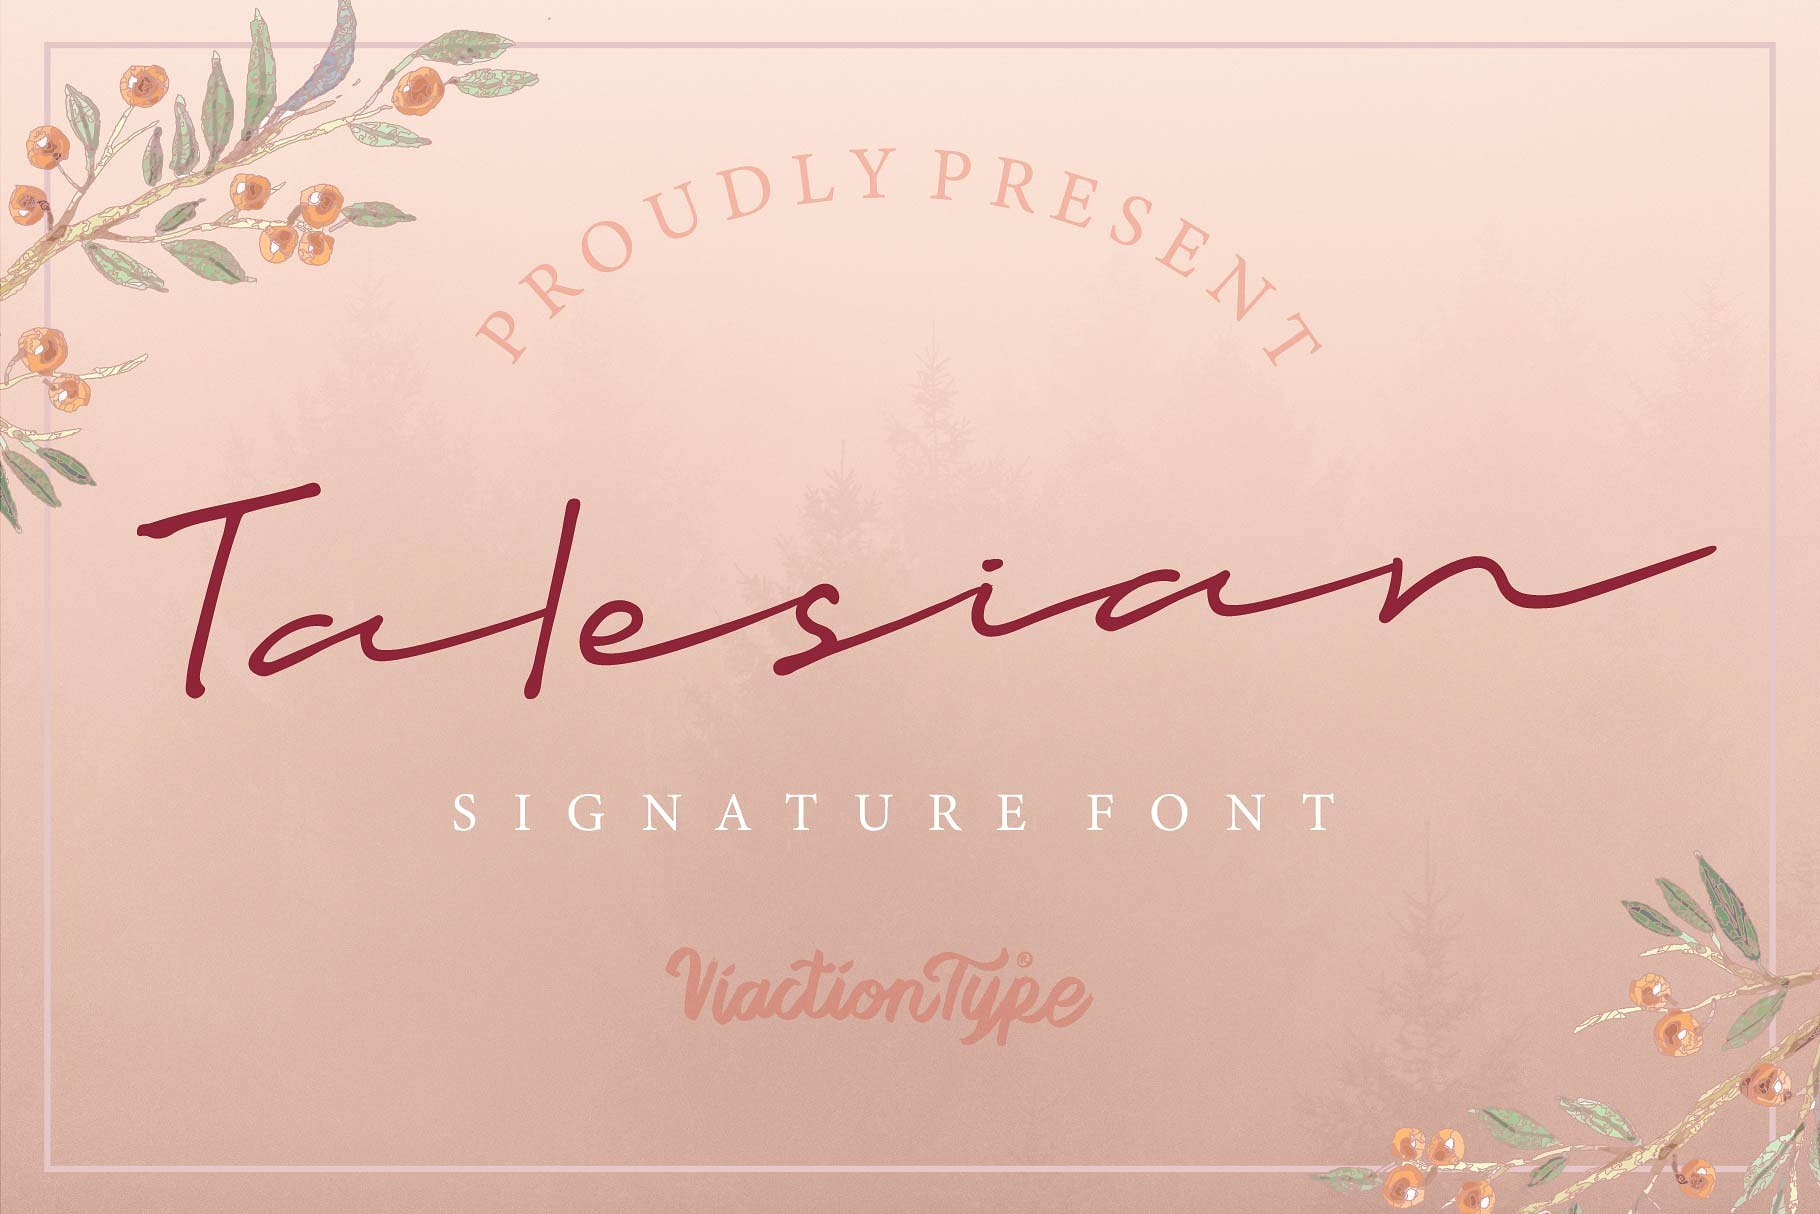 https://fontclarity.com/wp-content/uploads/2019/09/talesian-signature-font-download-0.jpg Free Download